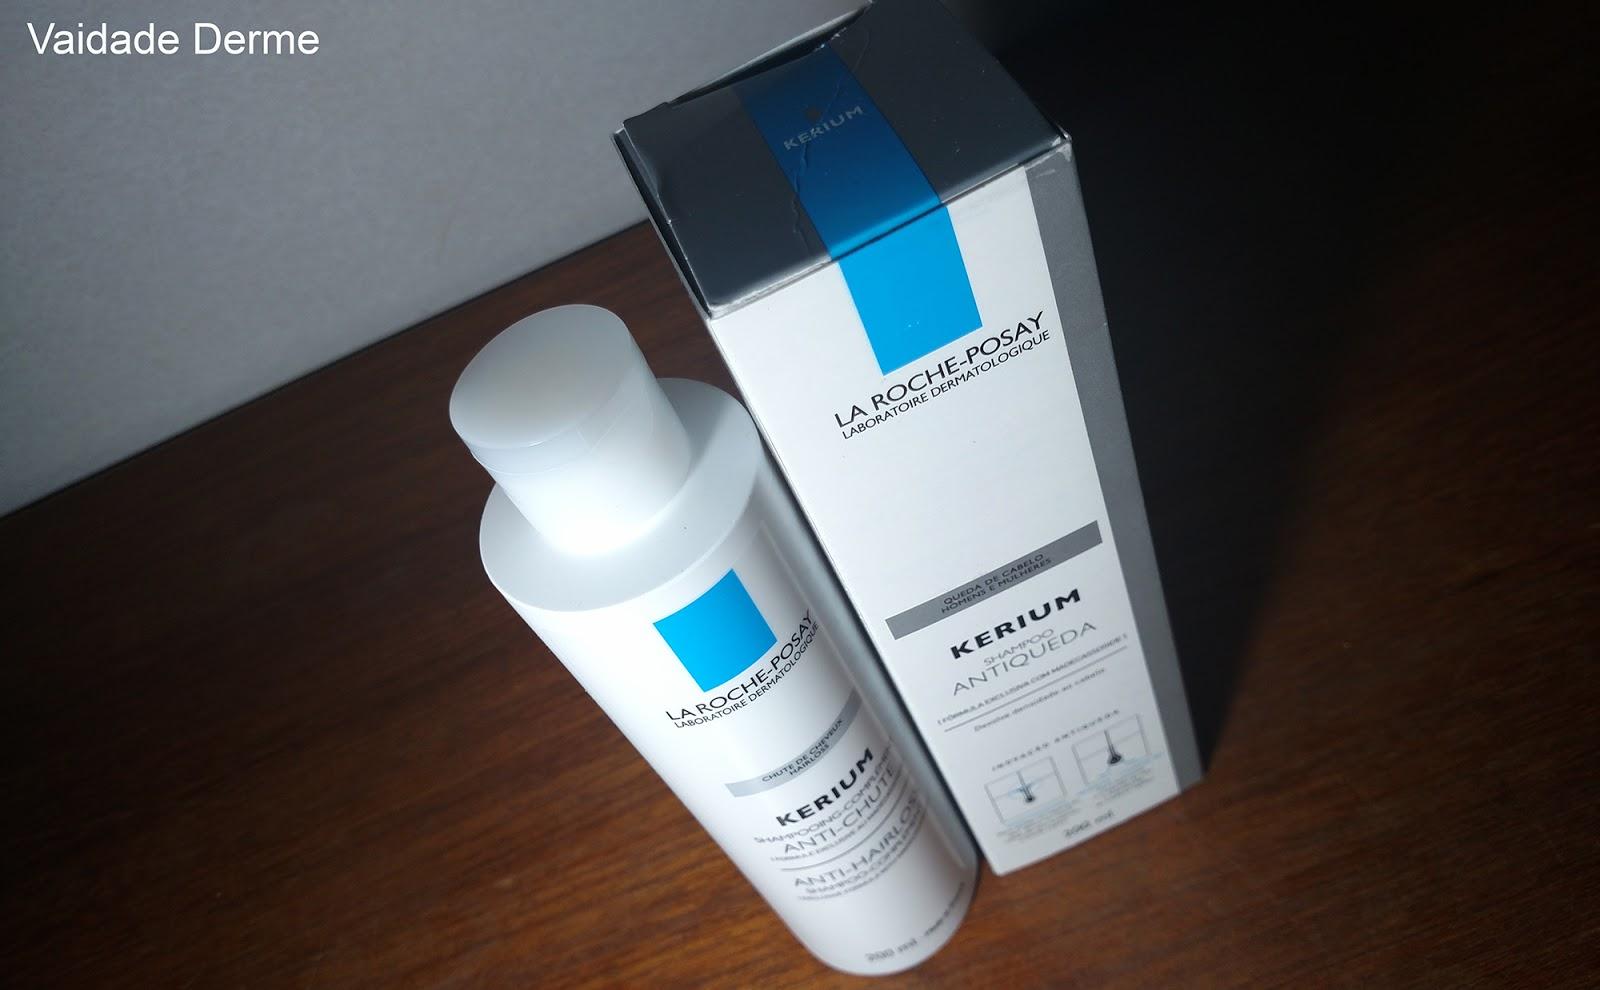 La Roche-Posay Kerium Shampoo Antiqueda